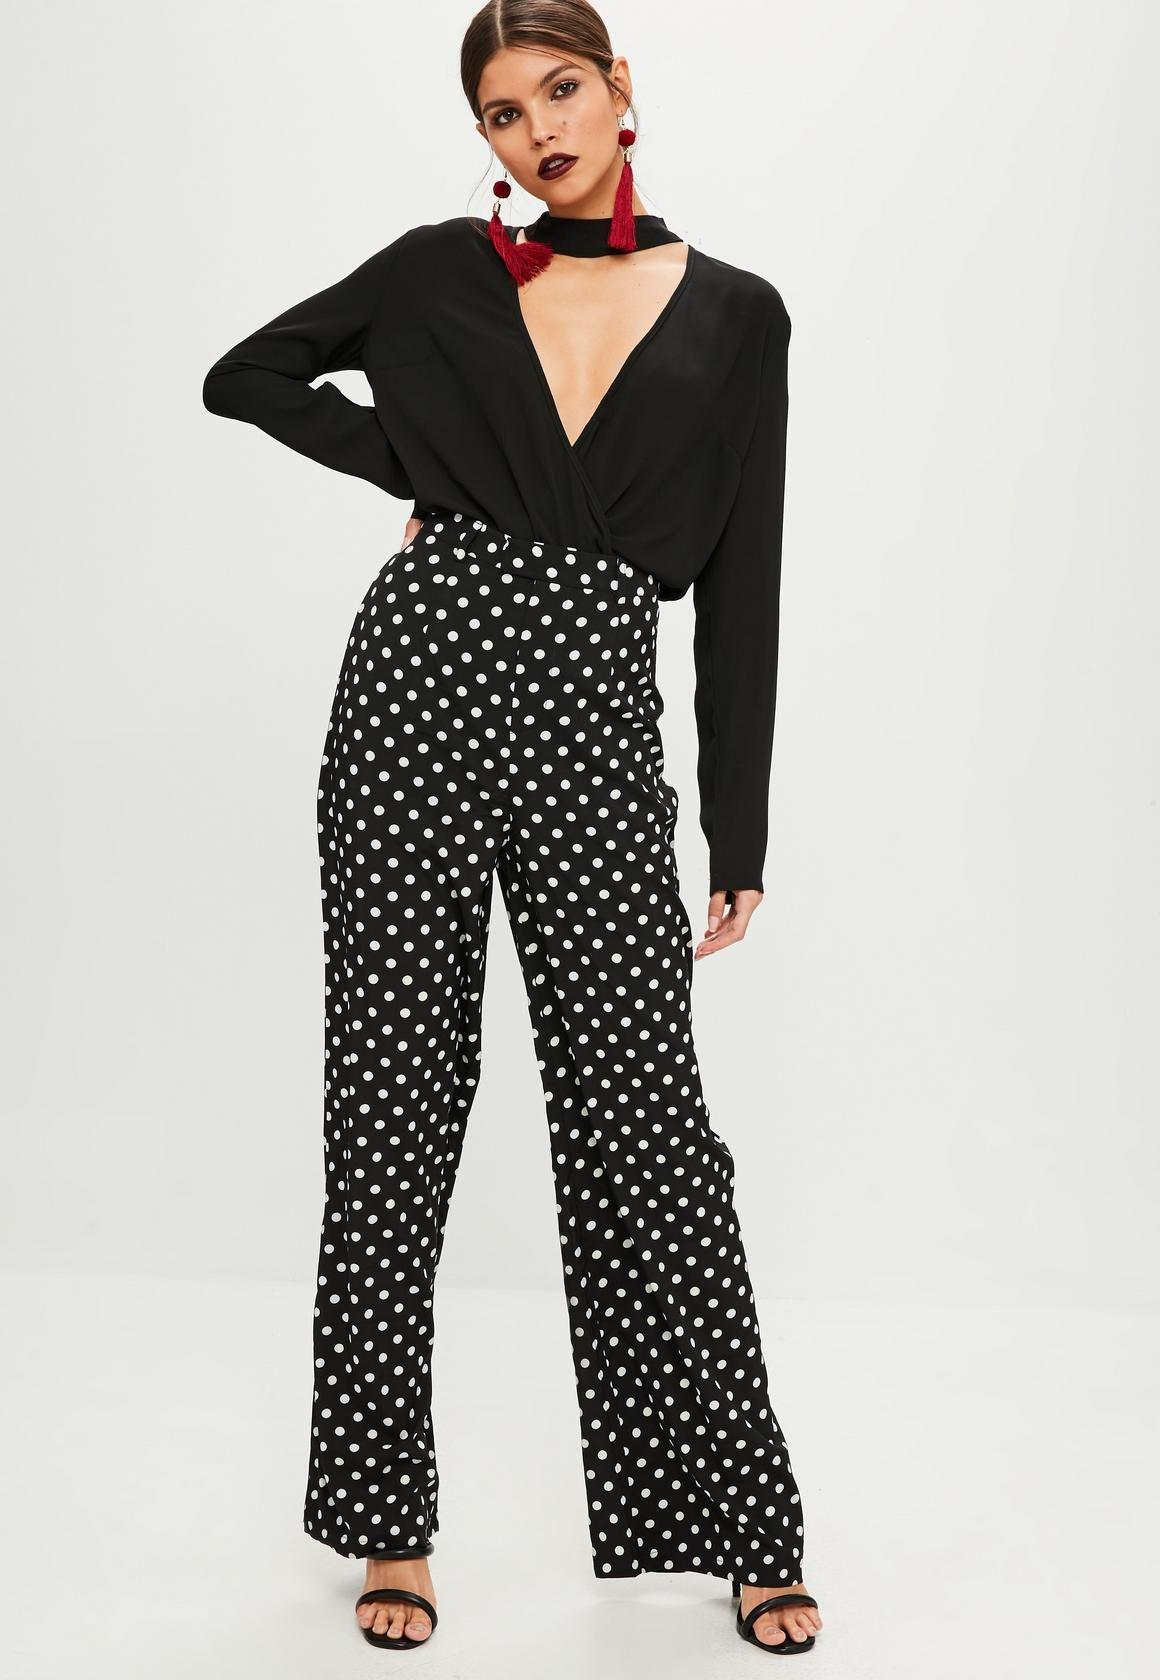 79b6789226 Missguided - Black Polka Dot Wide Leg Trousers   threads   Trousers ...